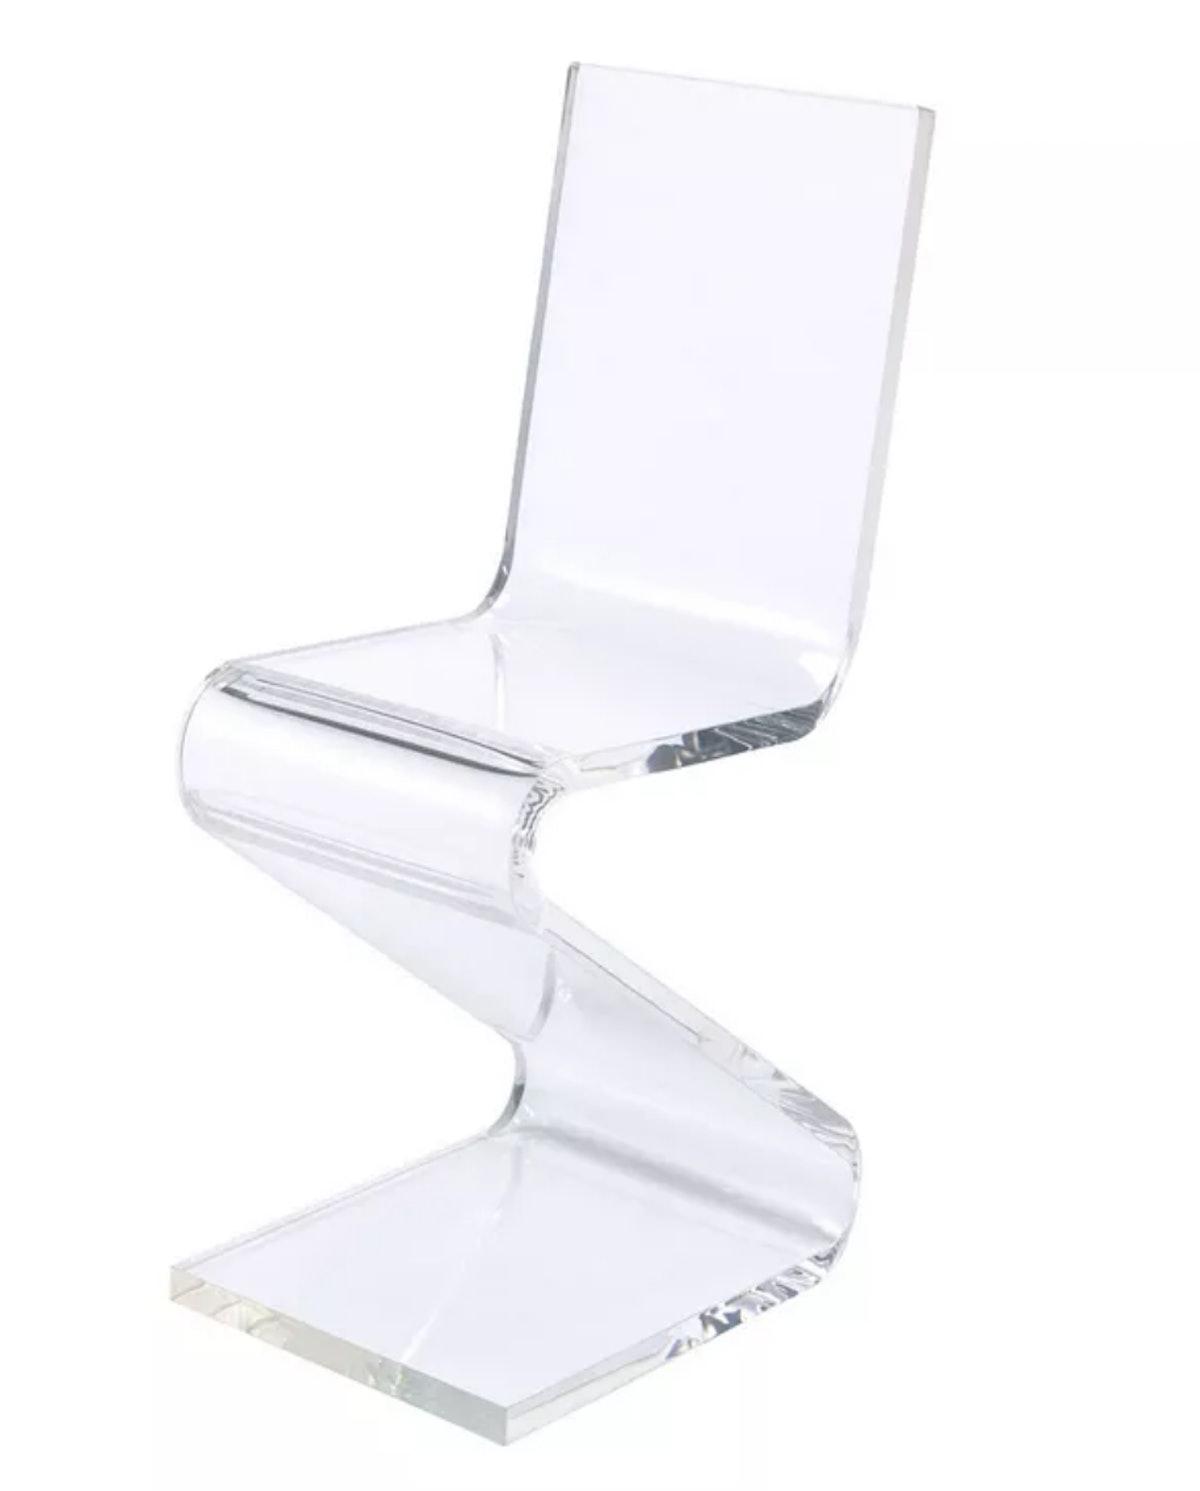 Peek Acrylic Z-Chair